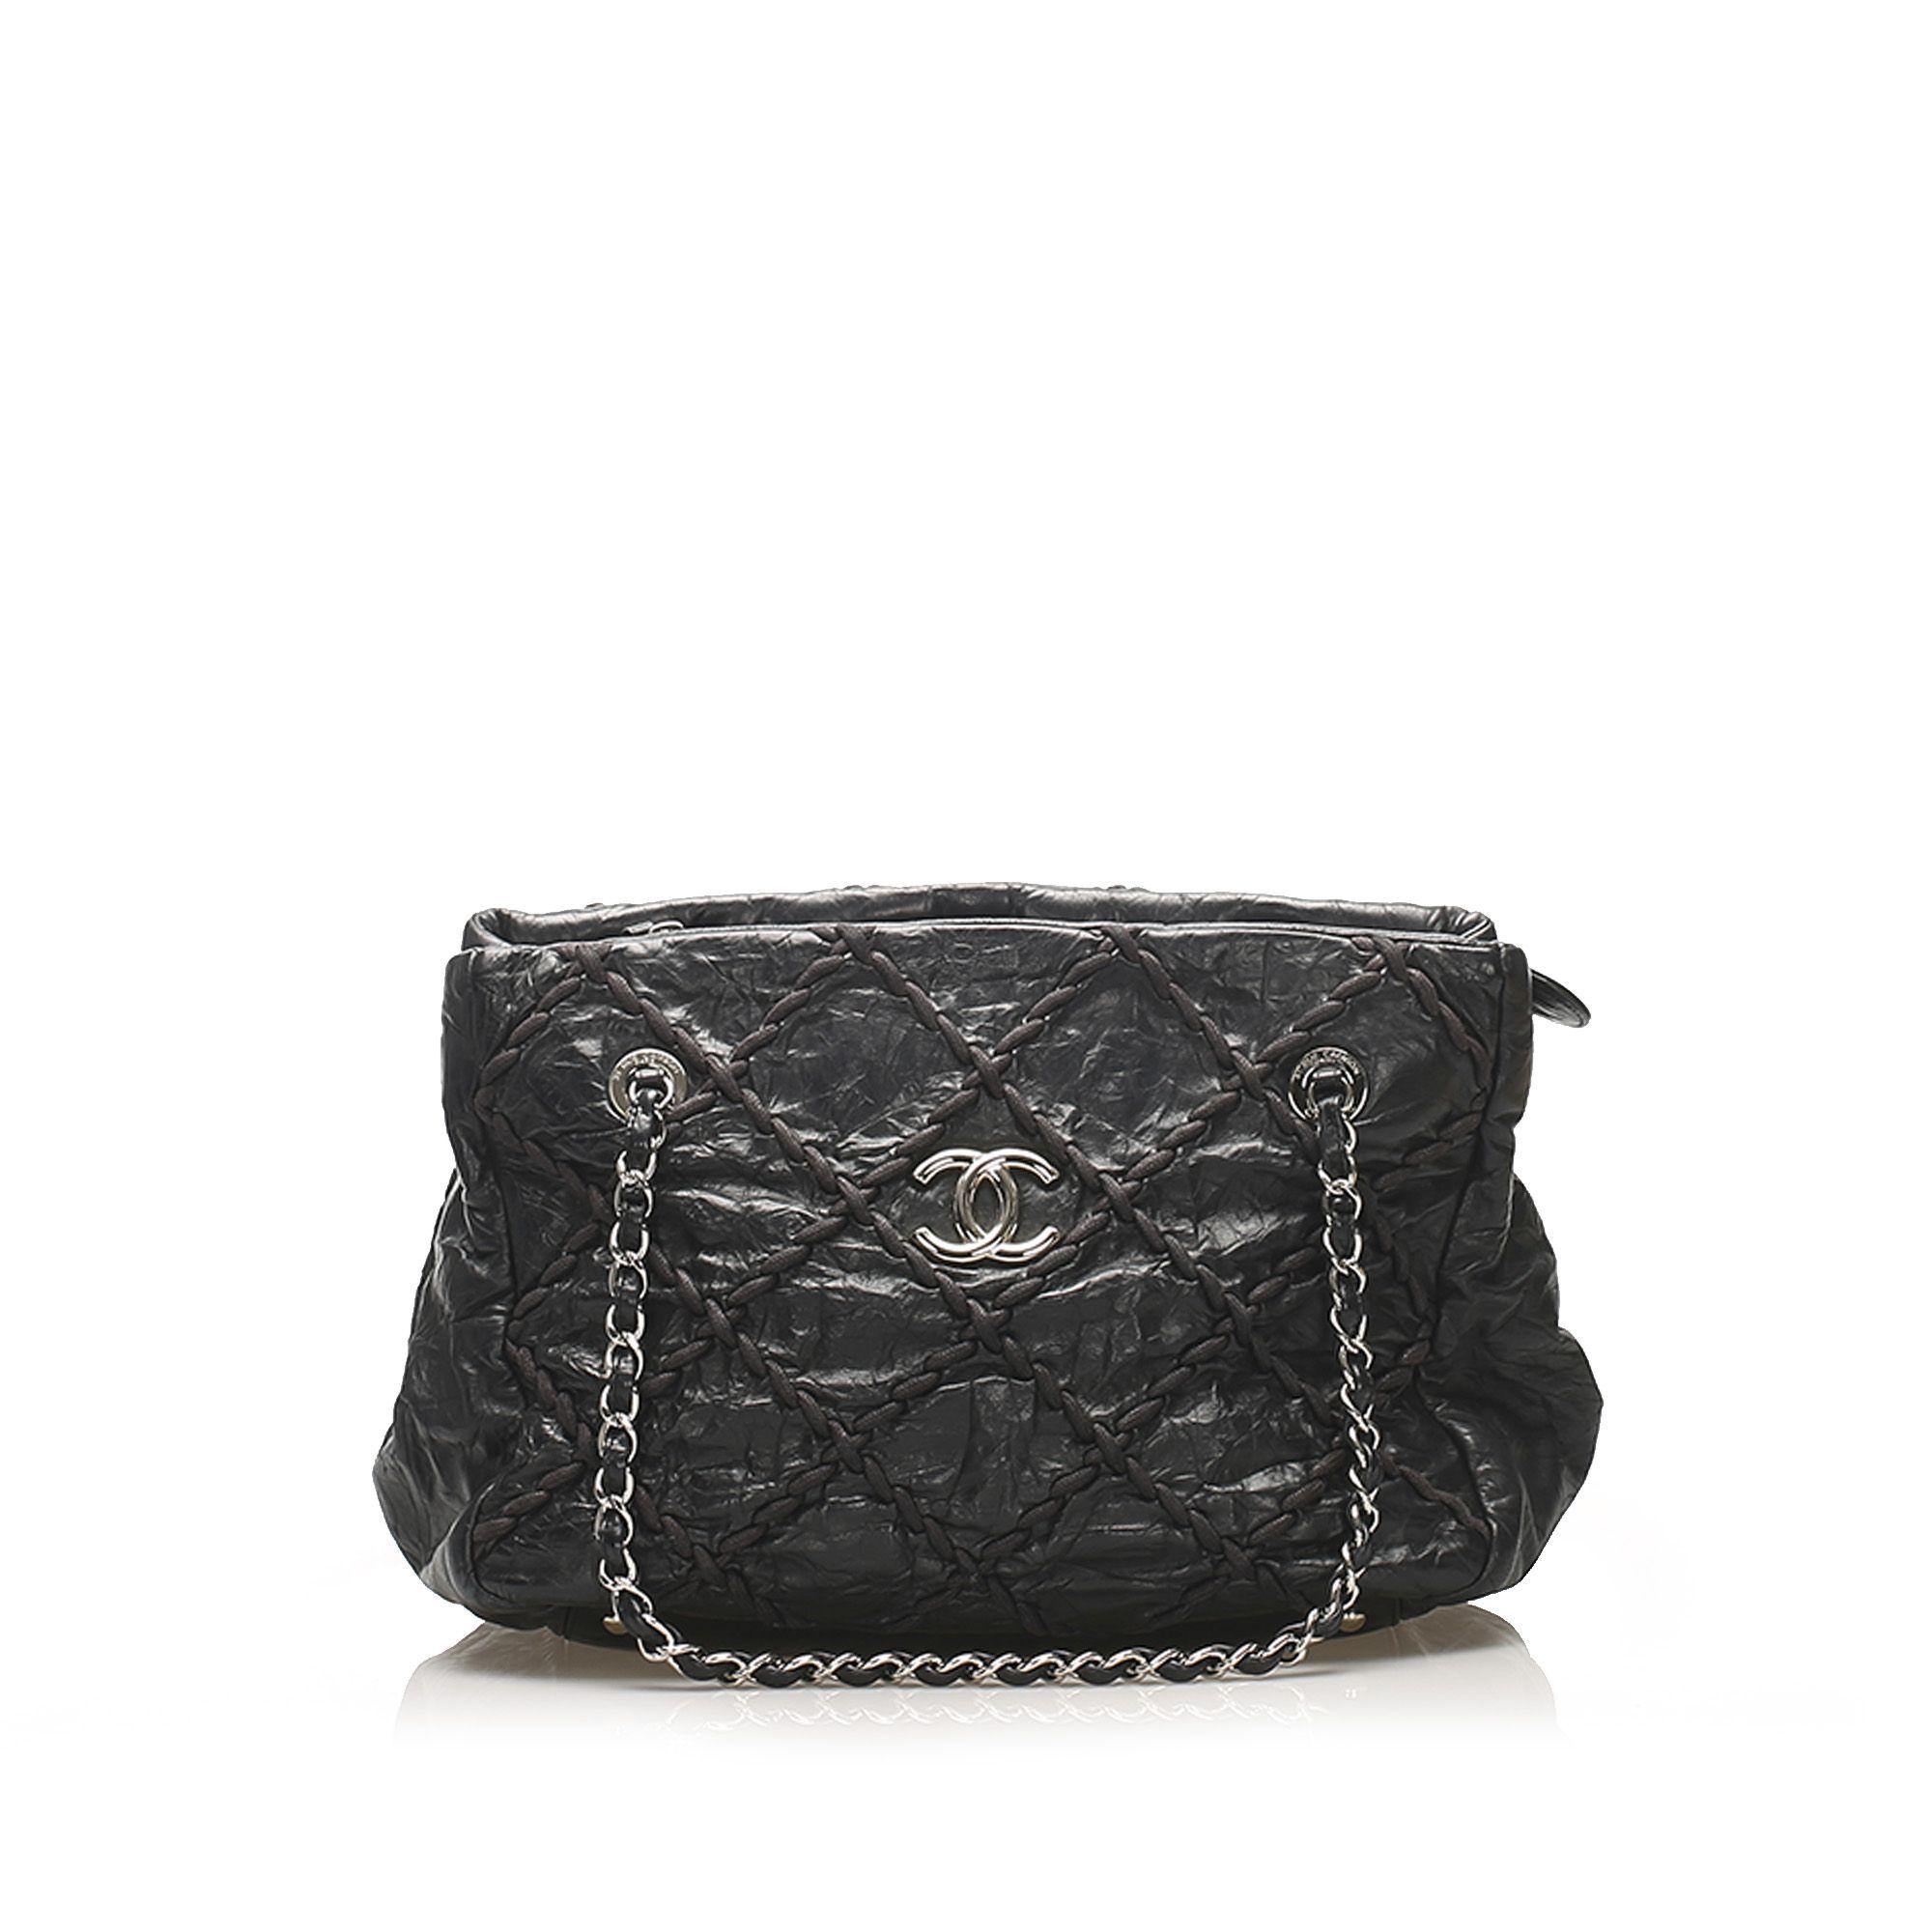 Vintage Chanel CC Wild Stitch Leather Tote Bag Black